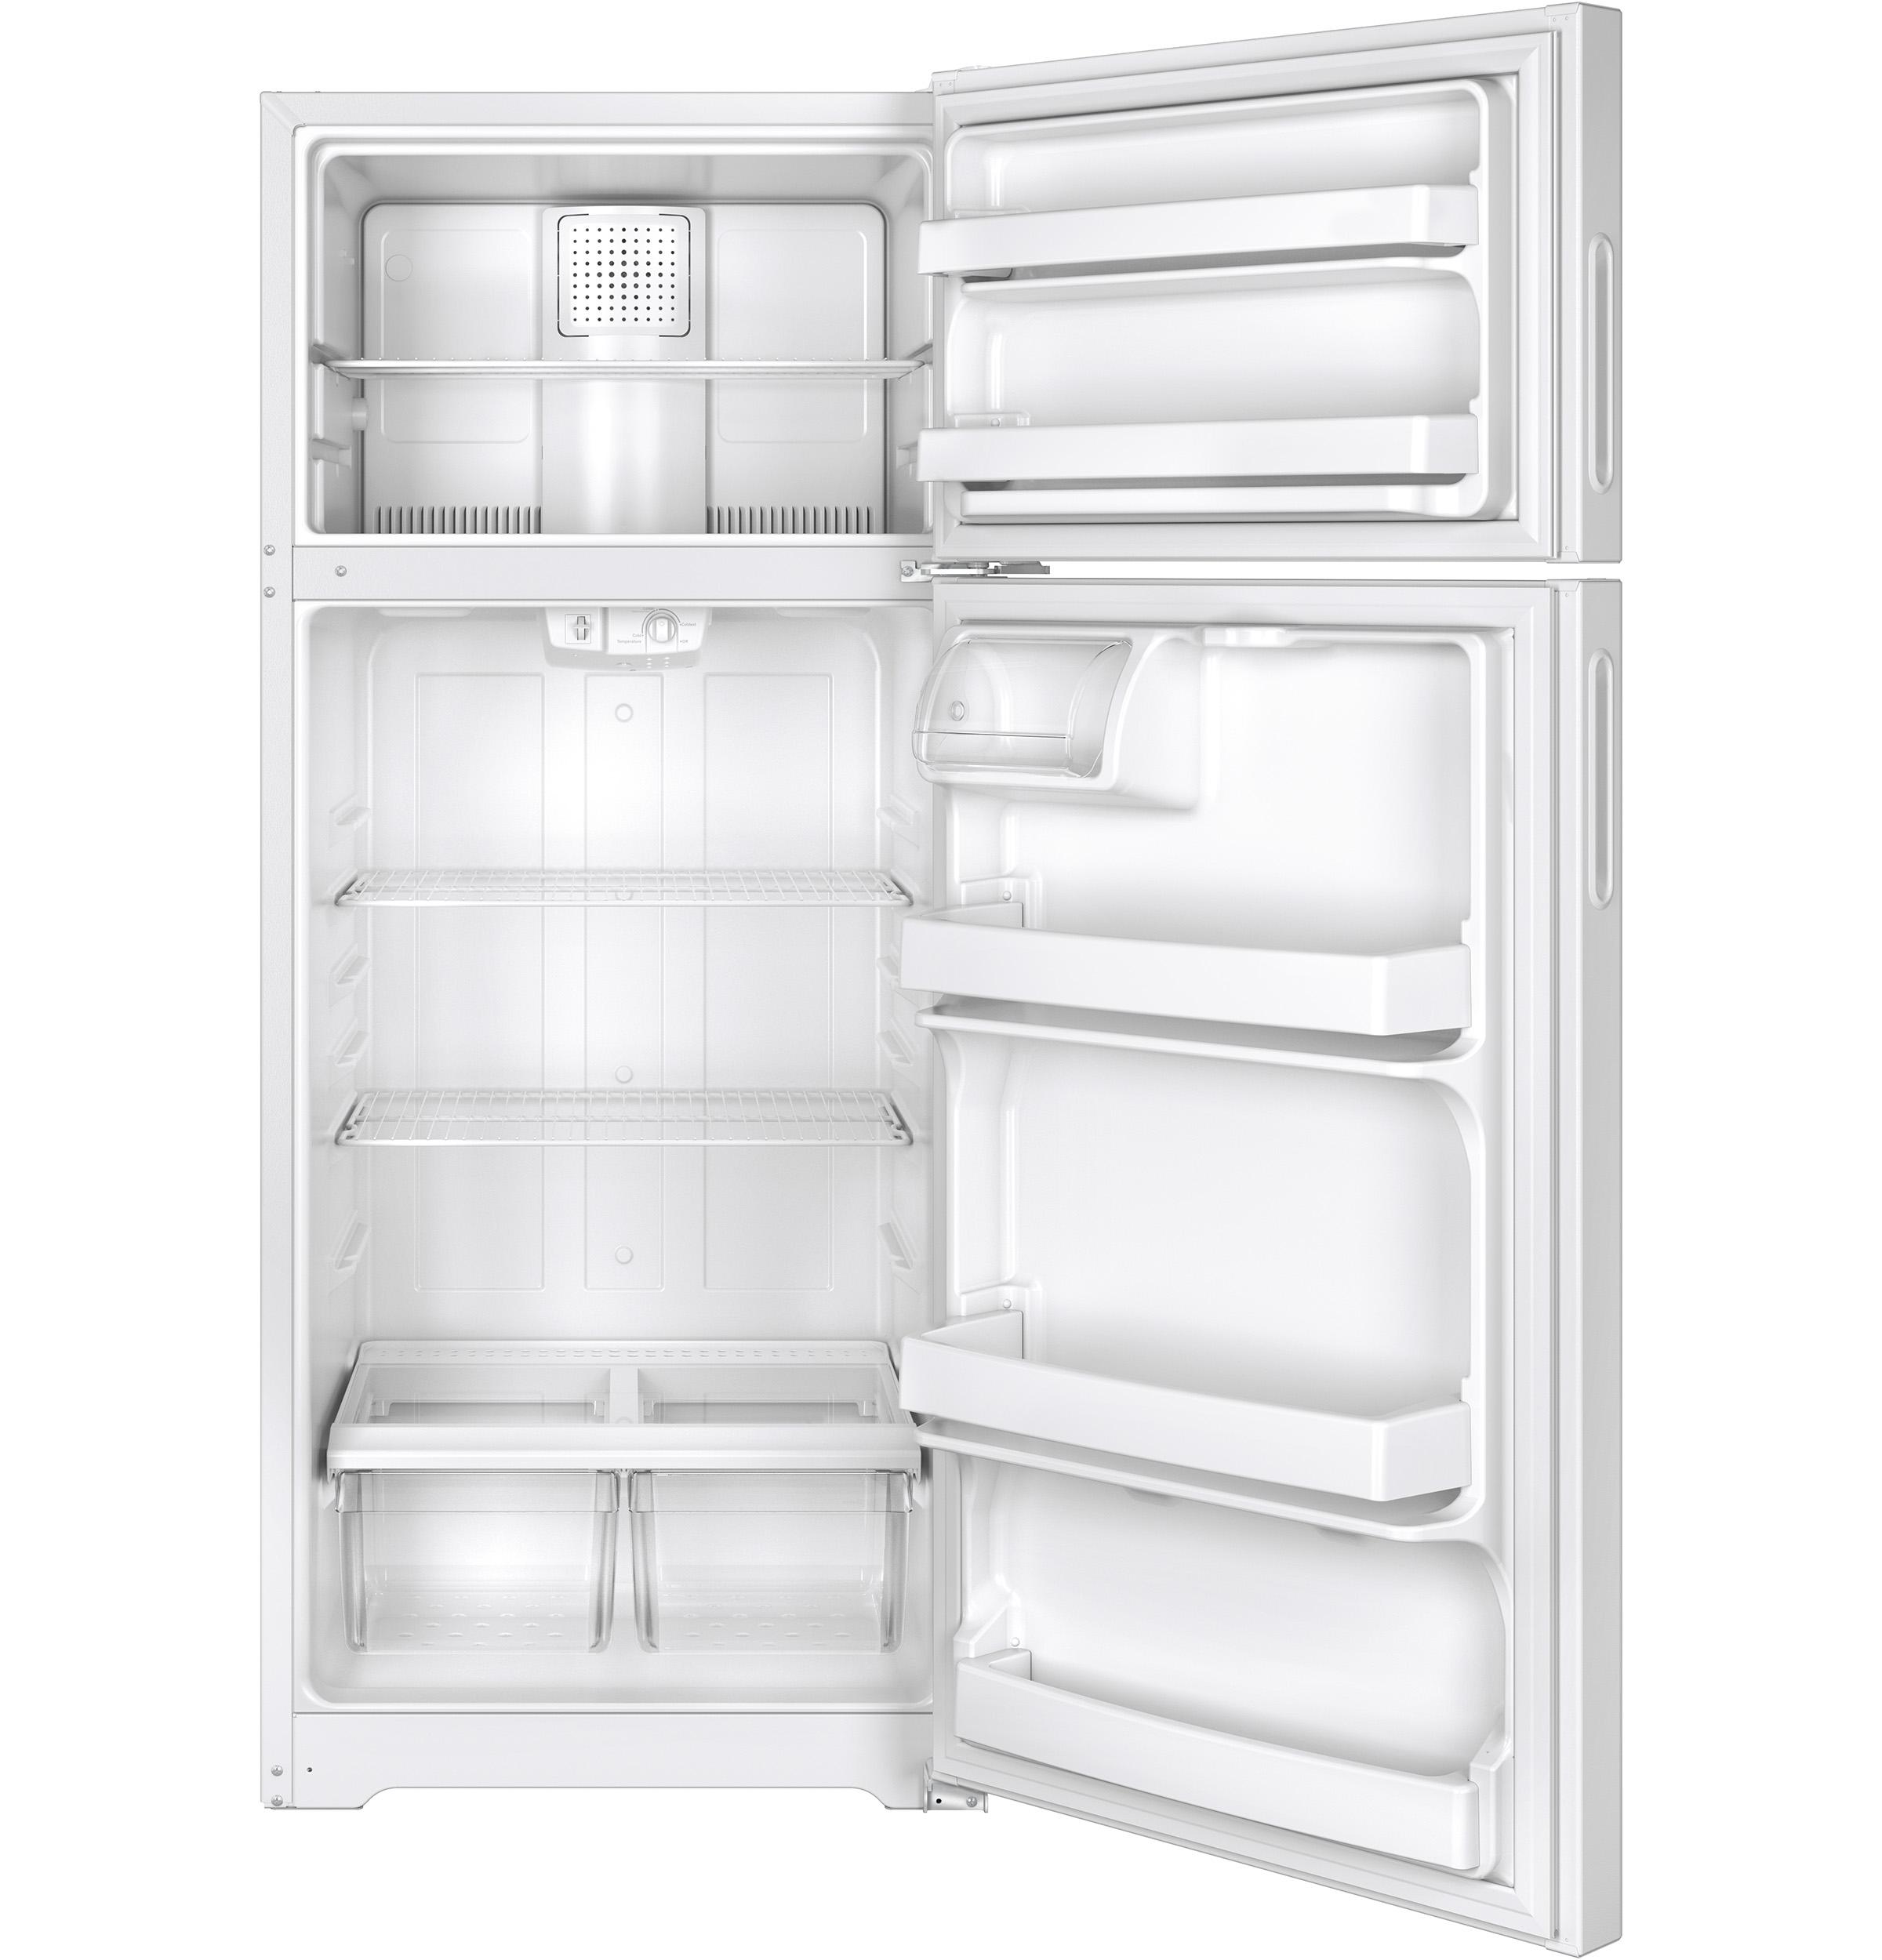 Hotpoint HPS18BTHWW 17.6 cu. ft. Top-Freezer Refrigerator - White